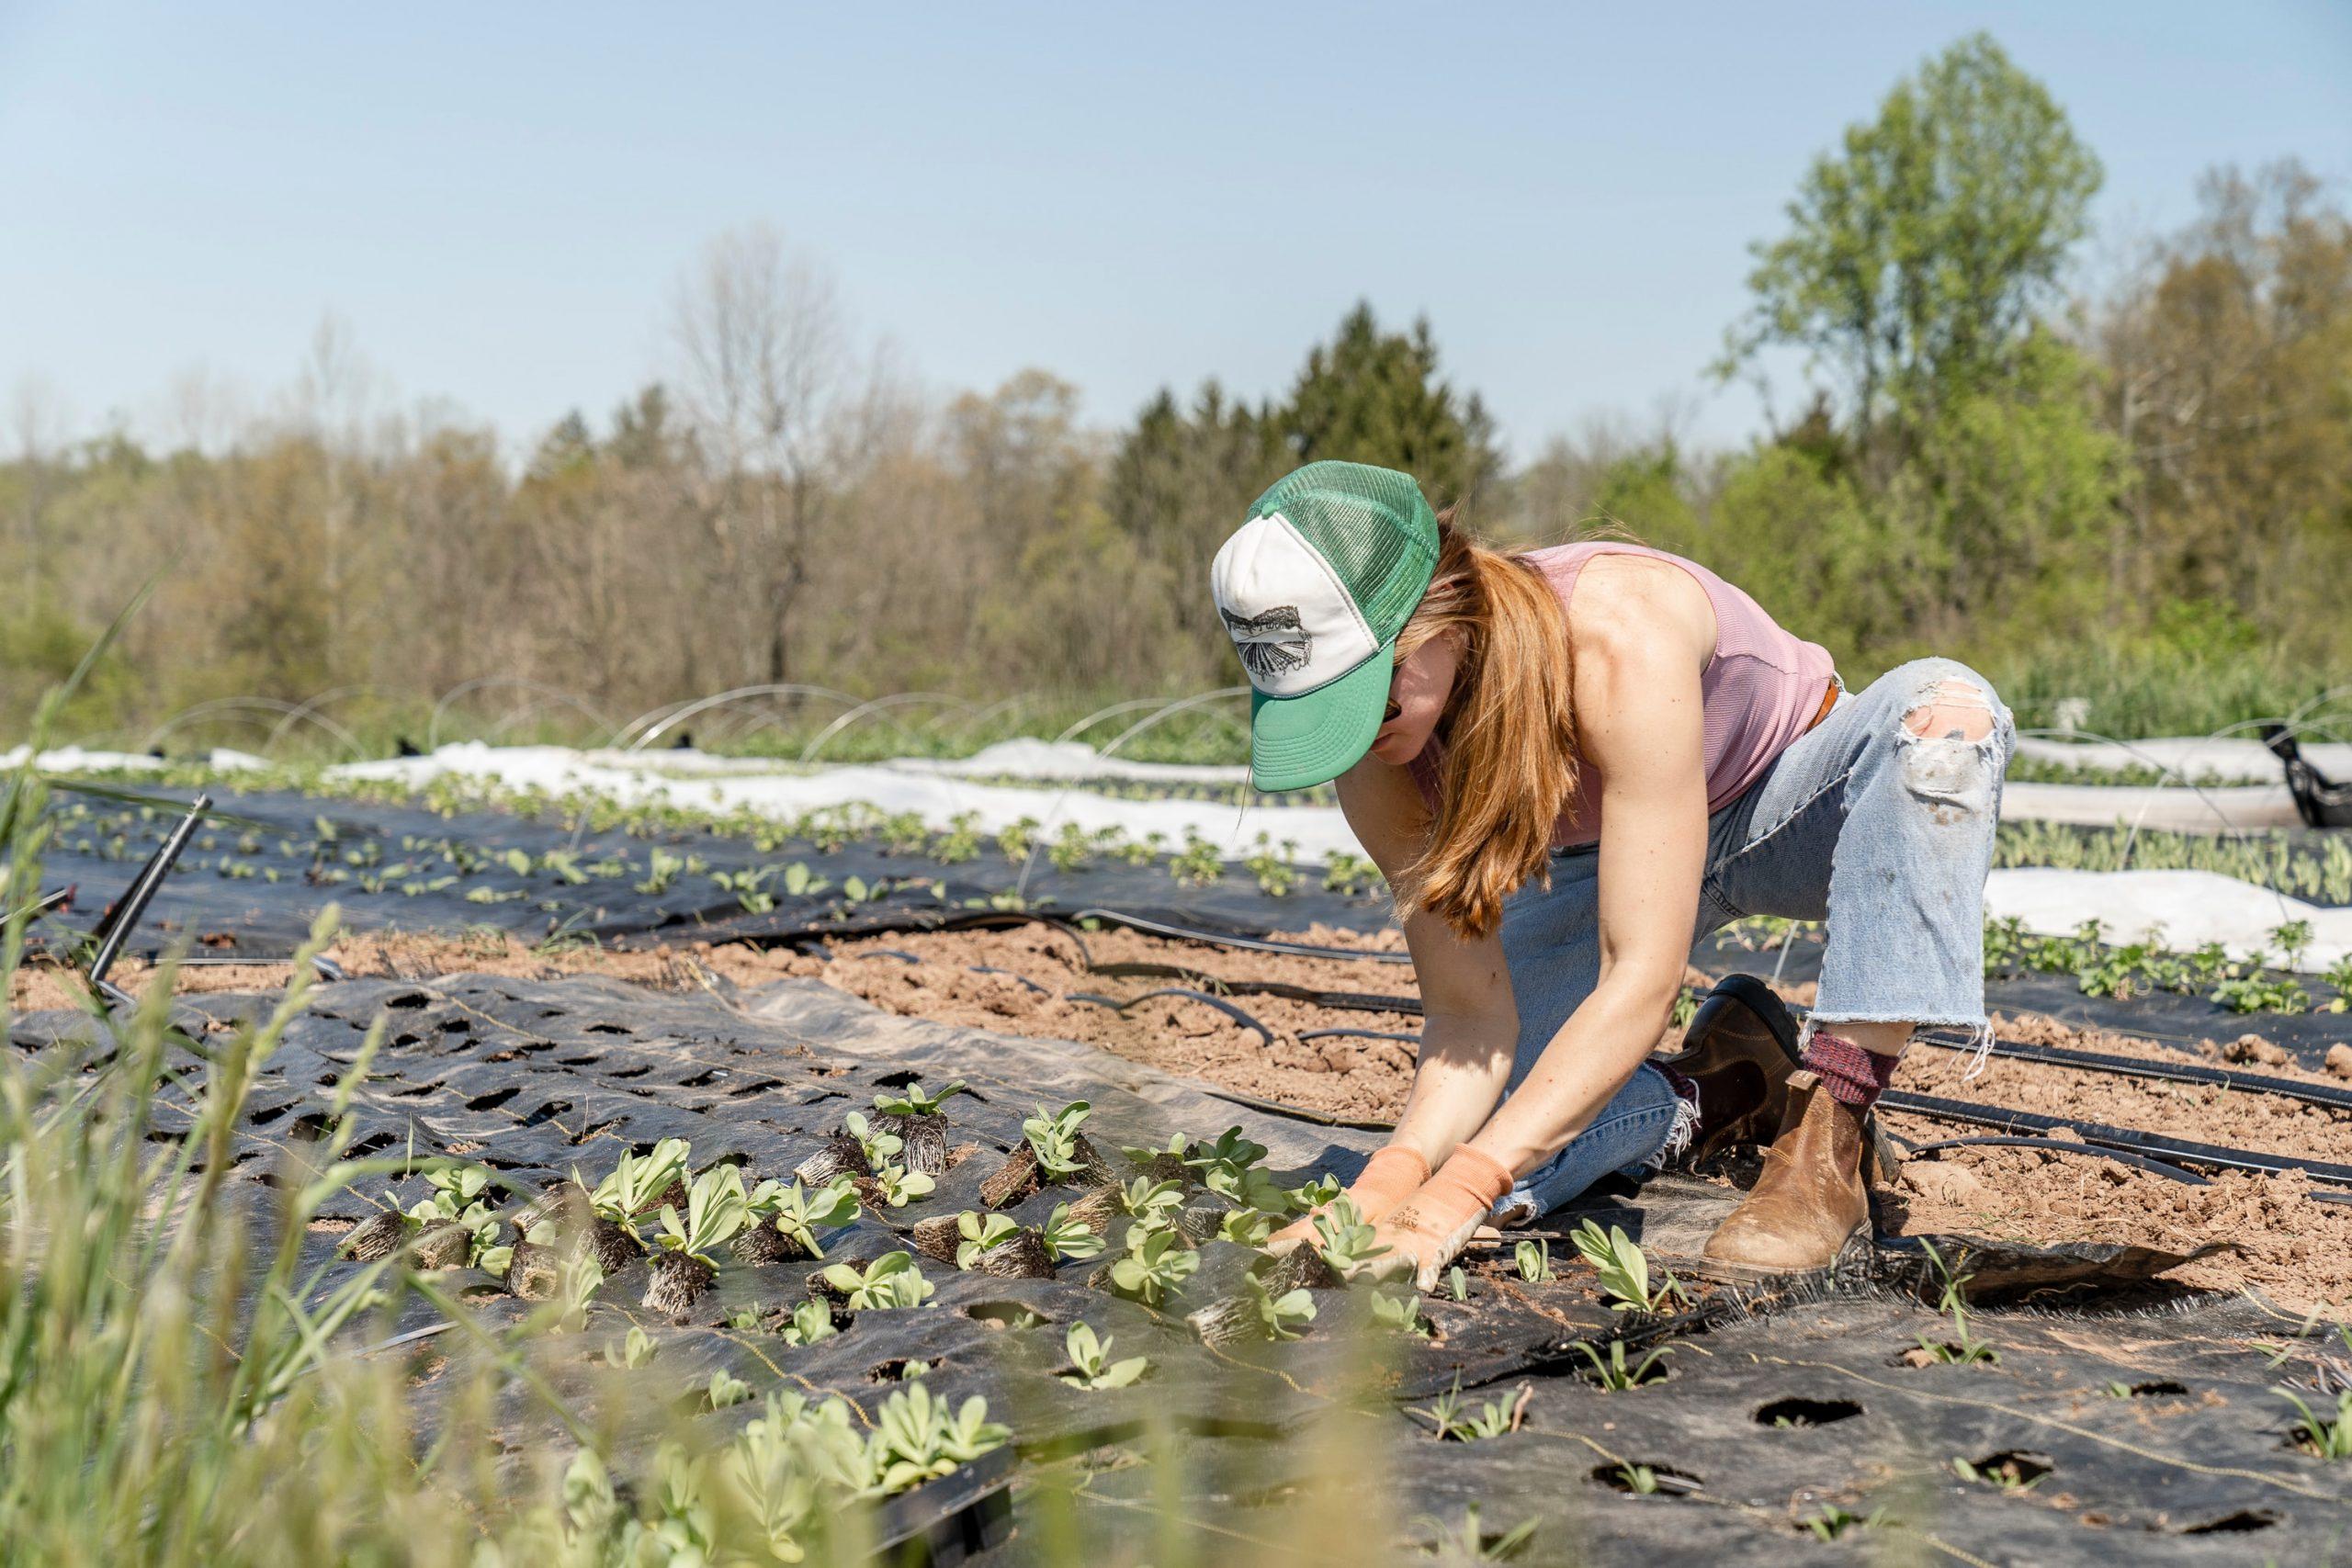 Frau pflanzt Grünpflanze